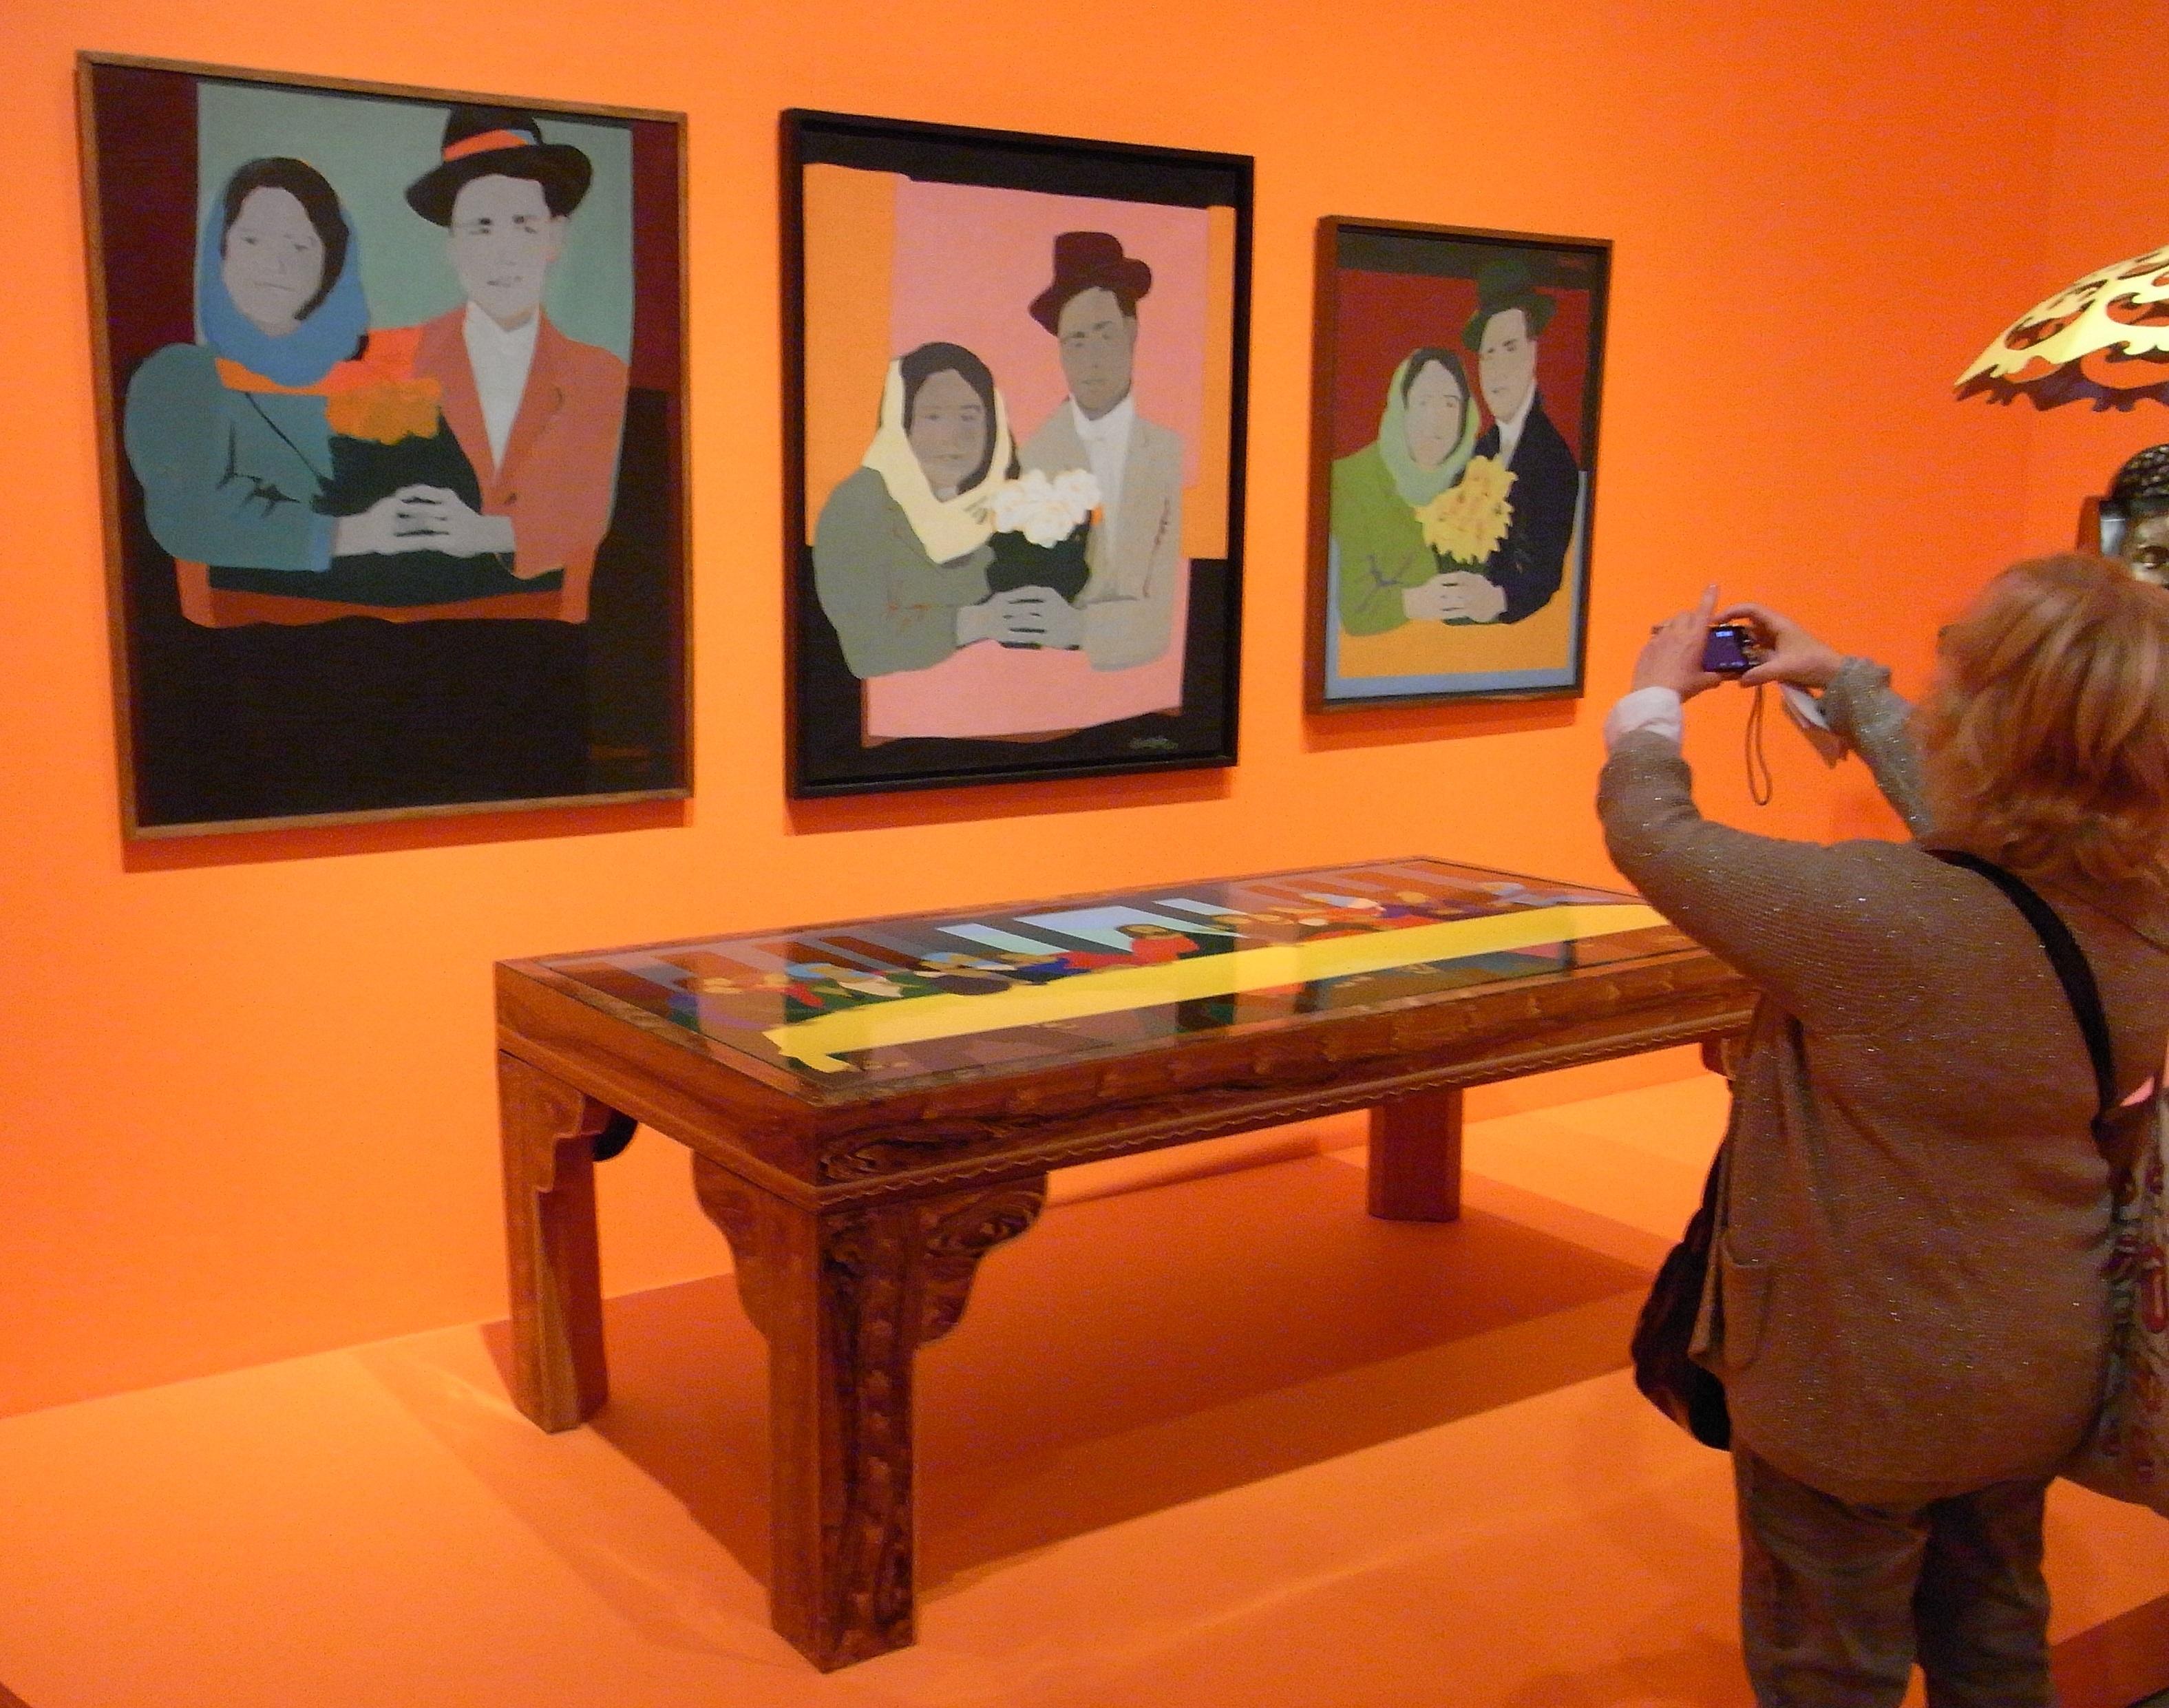 Muebles Pop Art Bogota - Beatriz Gonz Lez The World Goes Pop Tate Modern London [mjhdah]https://amuse-images.vice.com/wp_upload/2016/11/4-Beatriz-Gonzalez_NacienFlorencia-1974_Courtesy-of-the-artist-Casas-Riegner.jpg